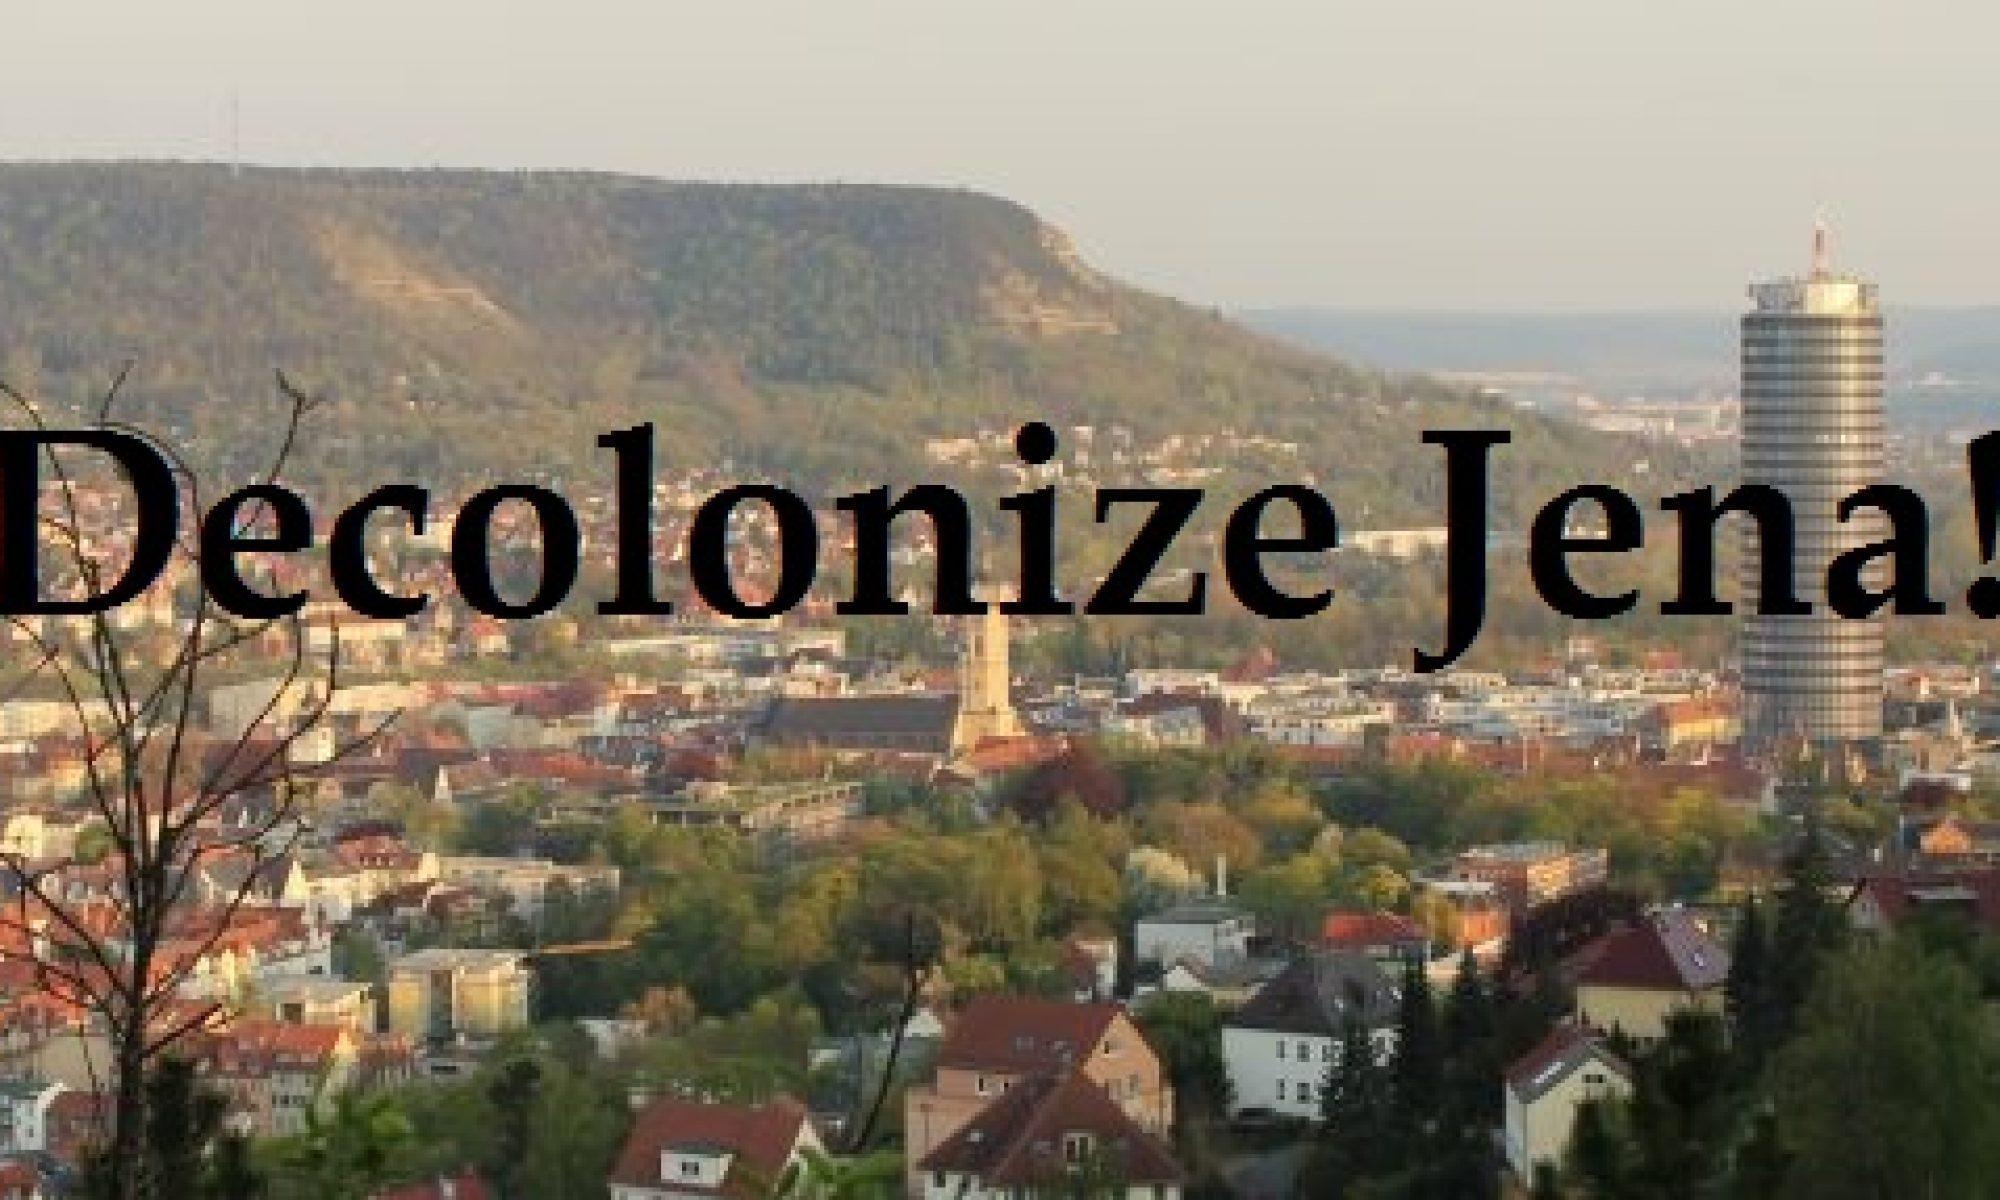 Decolonize Jena!